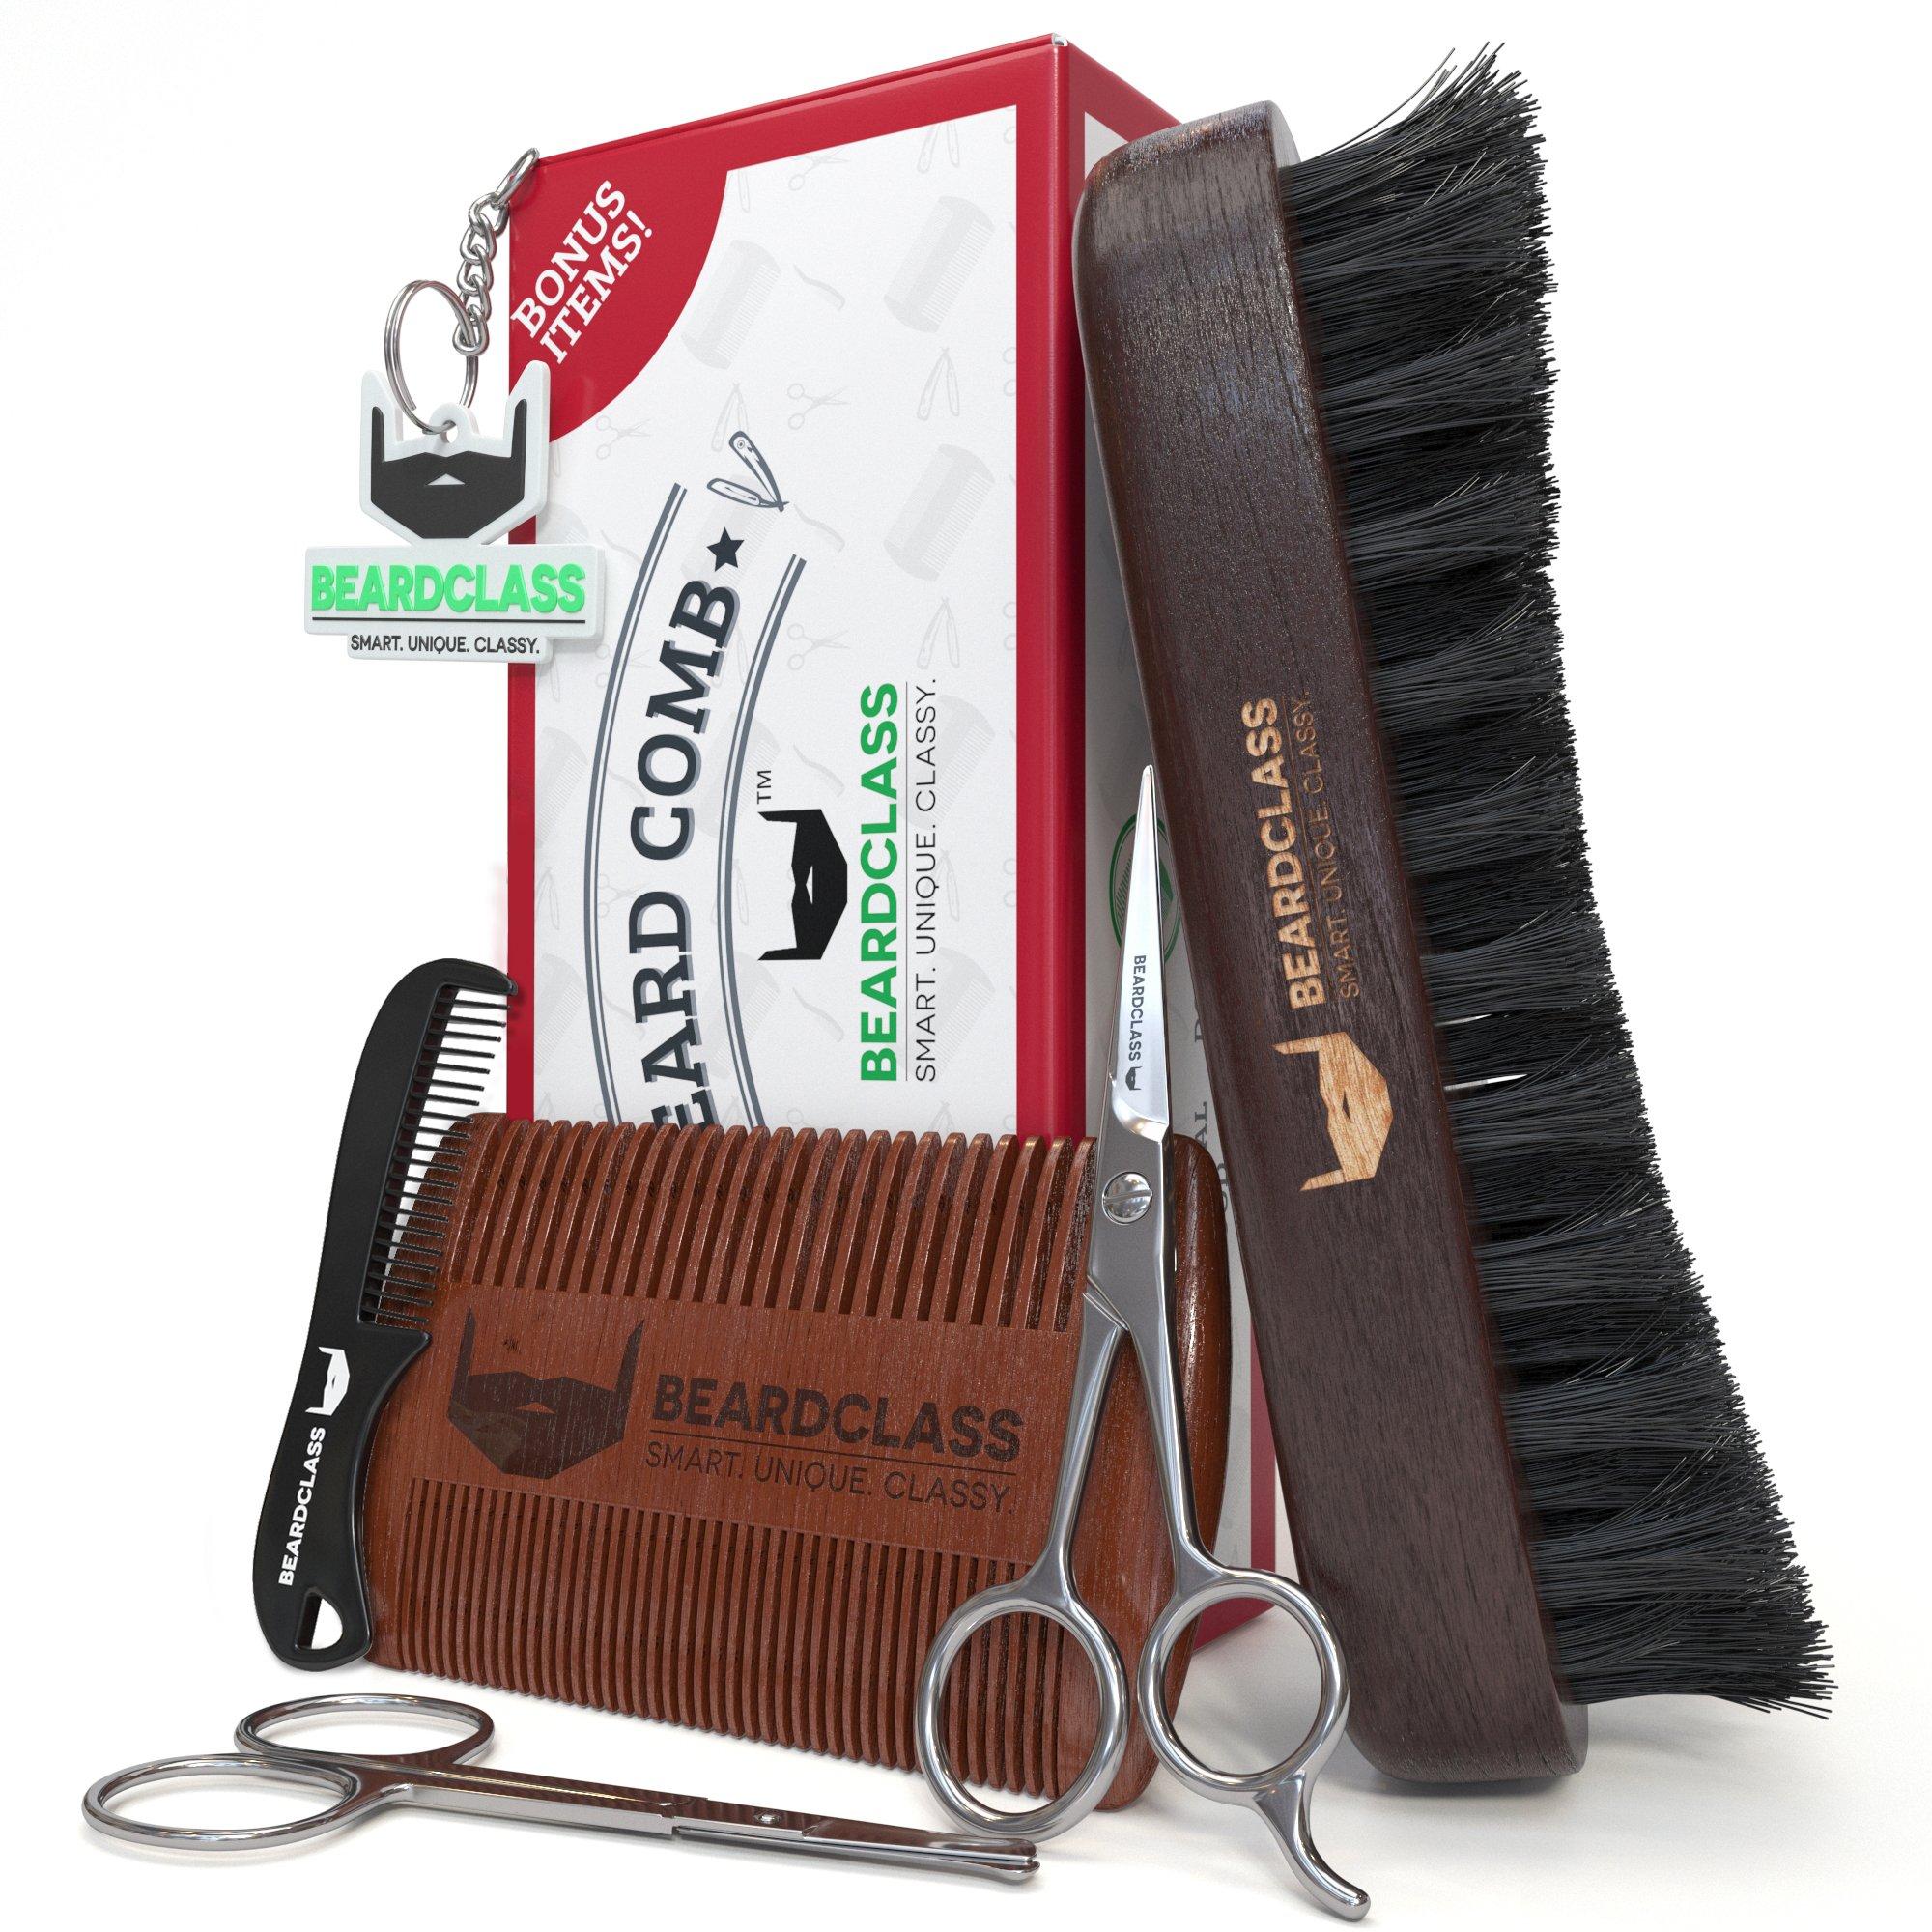 BEARDCLASS Beard Comb and Brush for men - 2 in 1 Dual Sided for Long and Short Beards - Bonus Items: Beard Brush, Beard Scissors, Mustache Scissors and Small Comb Set - 100% Natural Sandalwood